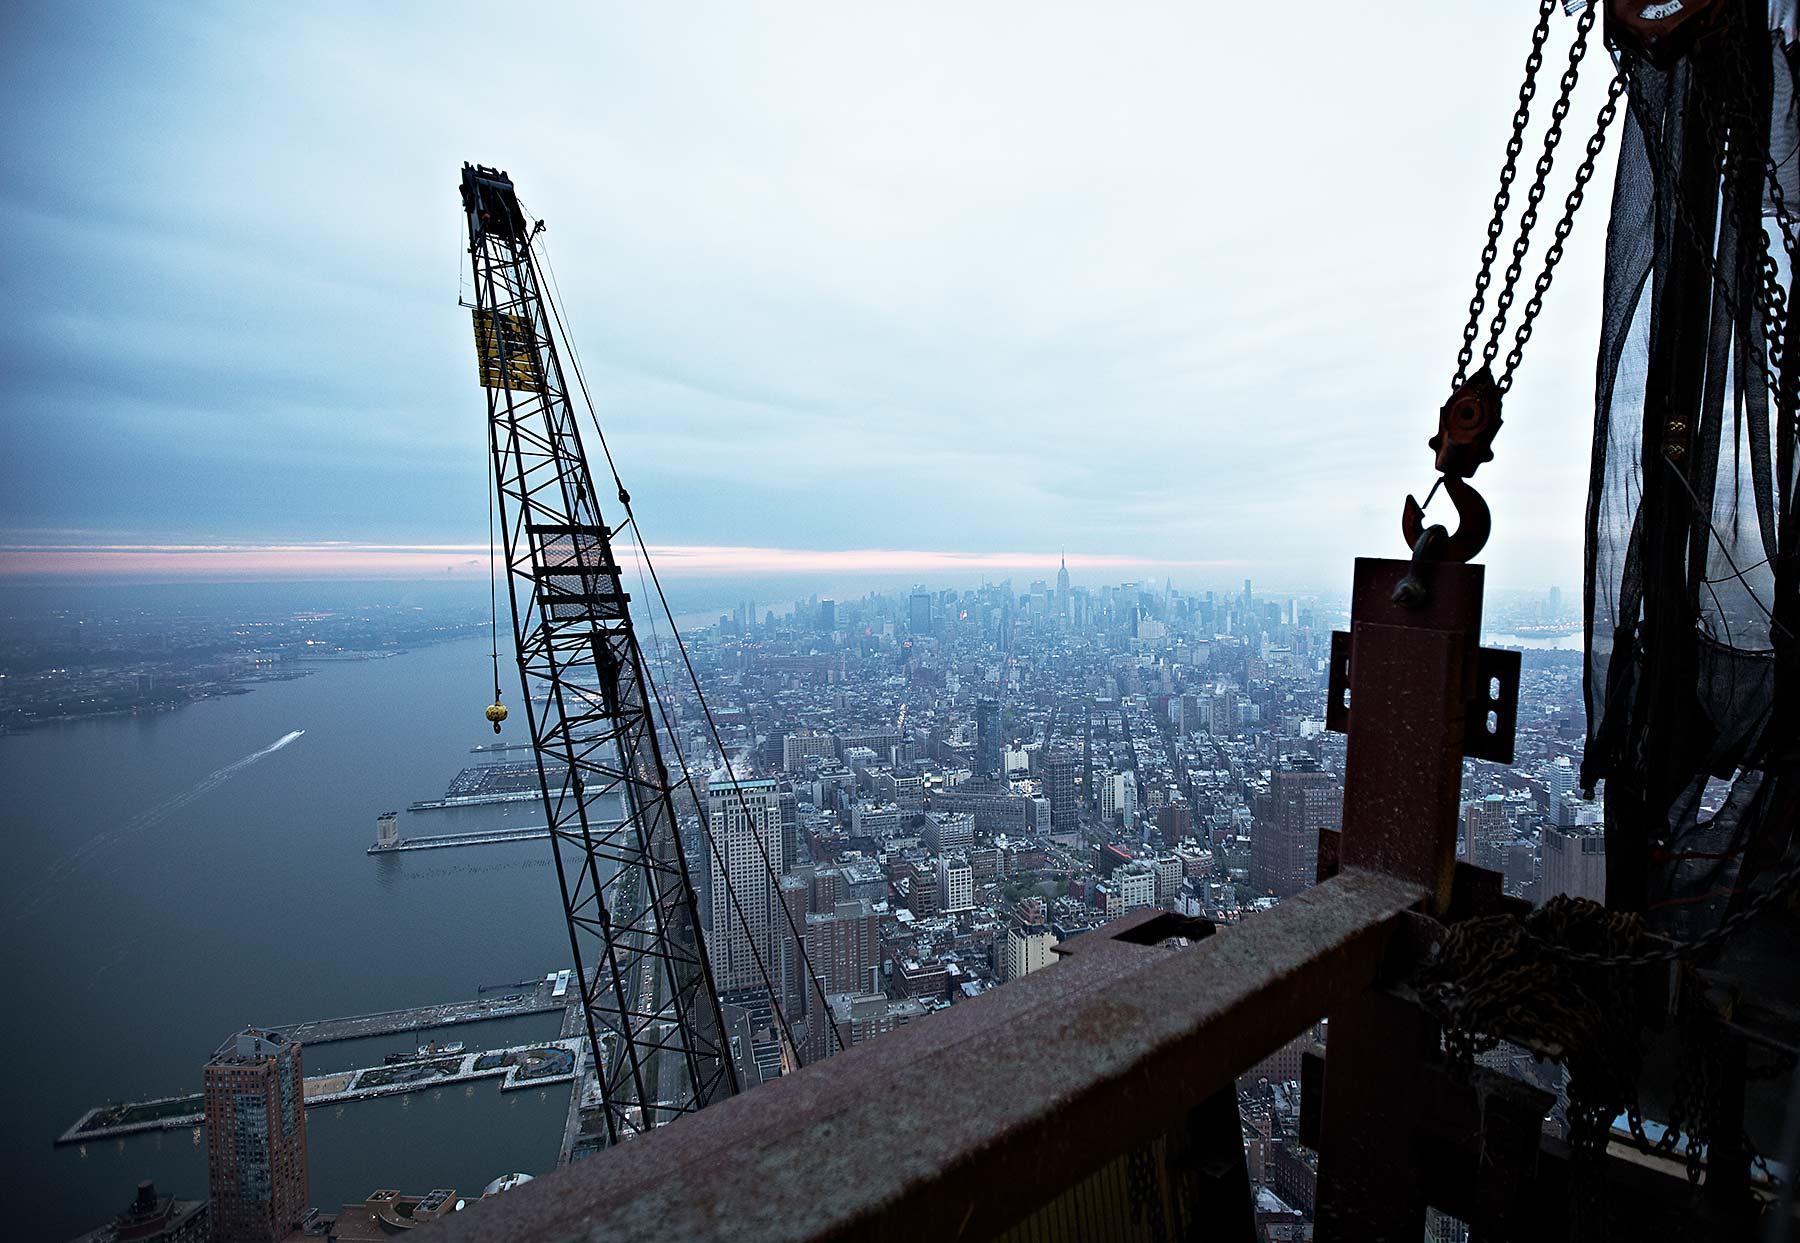 Jeremy-Frechette-OWTC-Construction-Crane.jpg